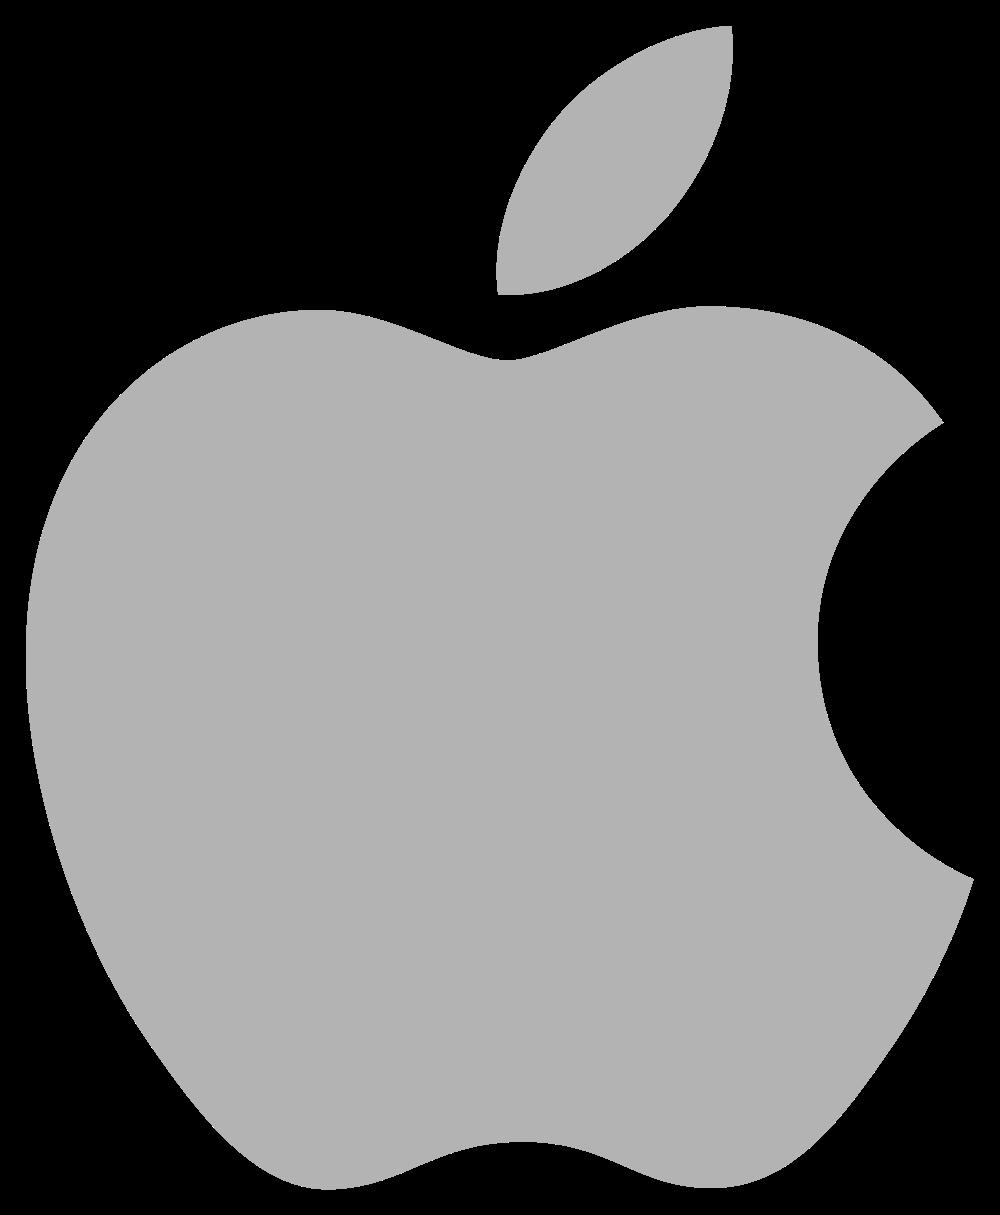 apple-bloo